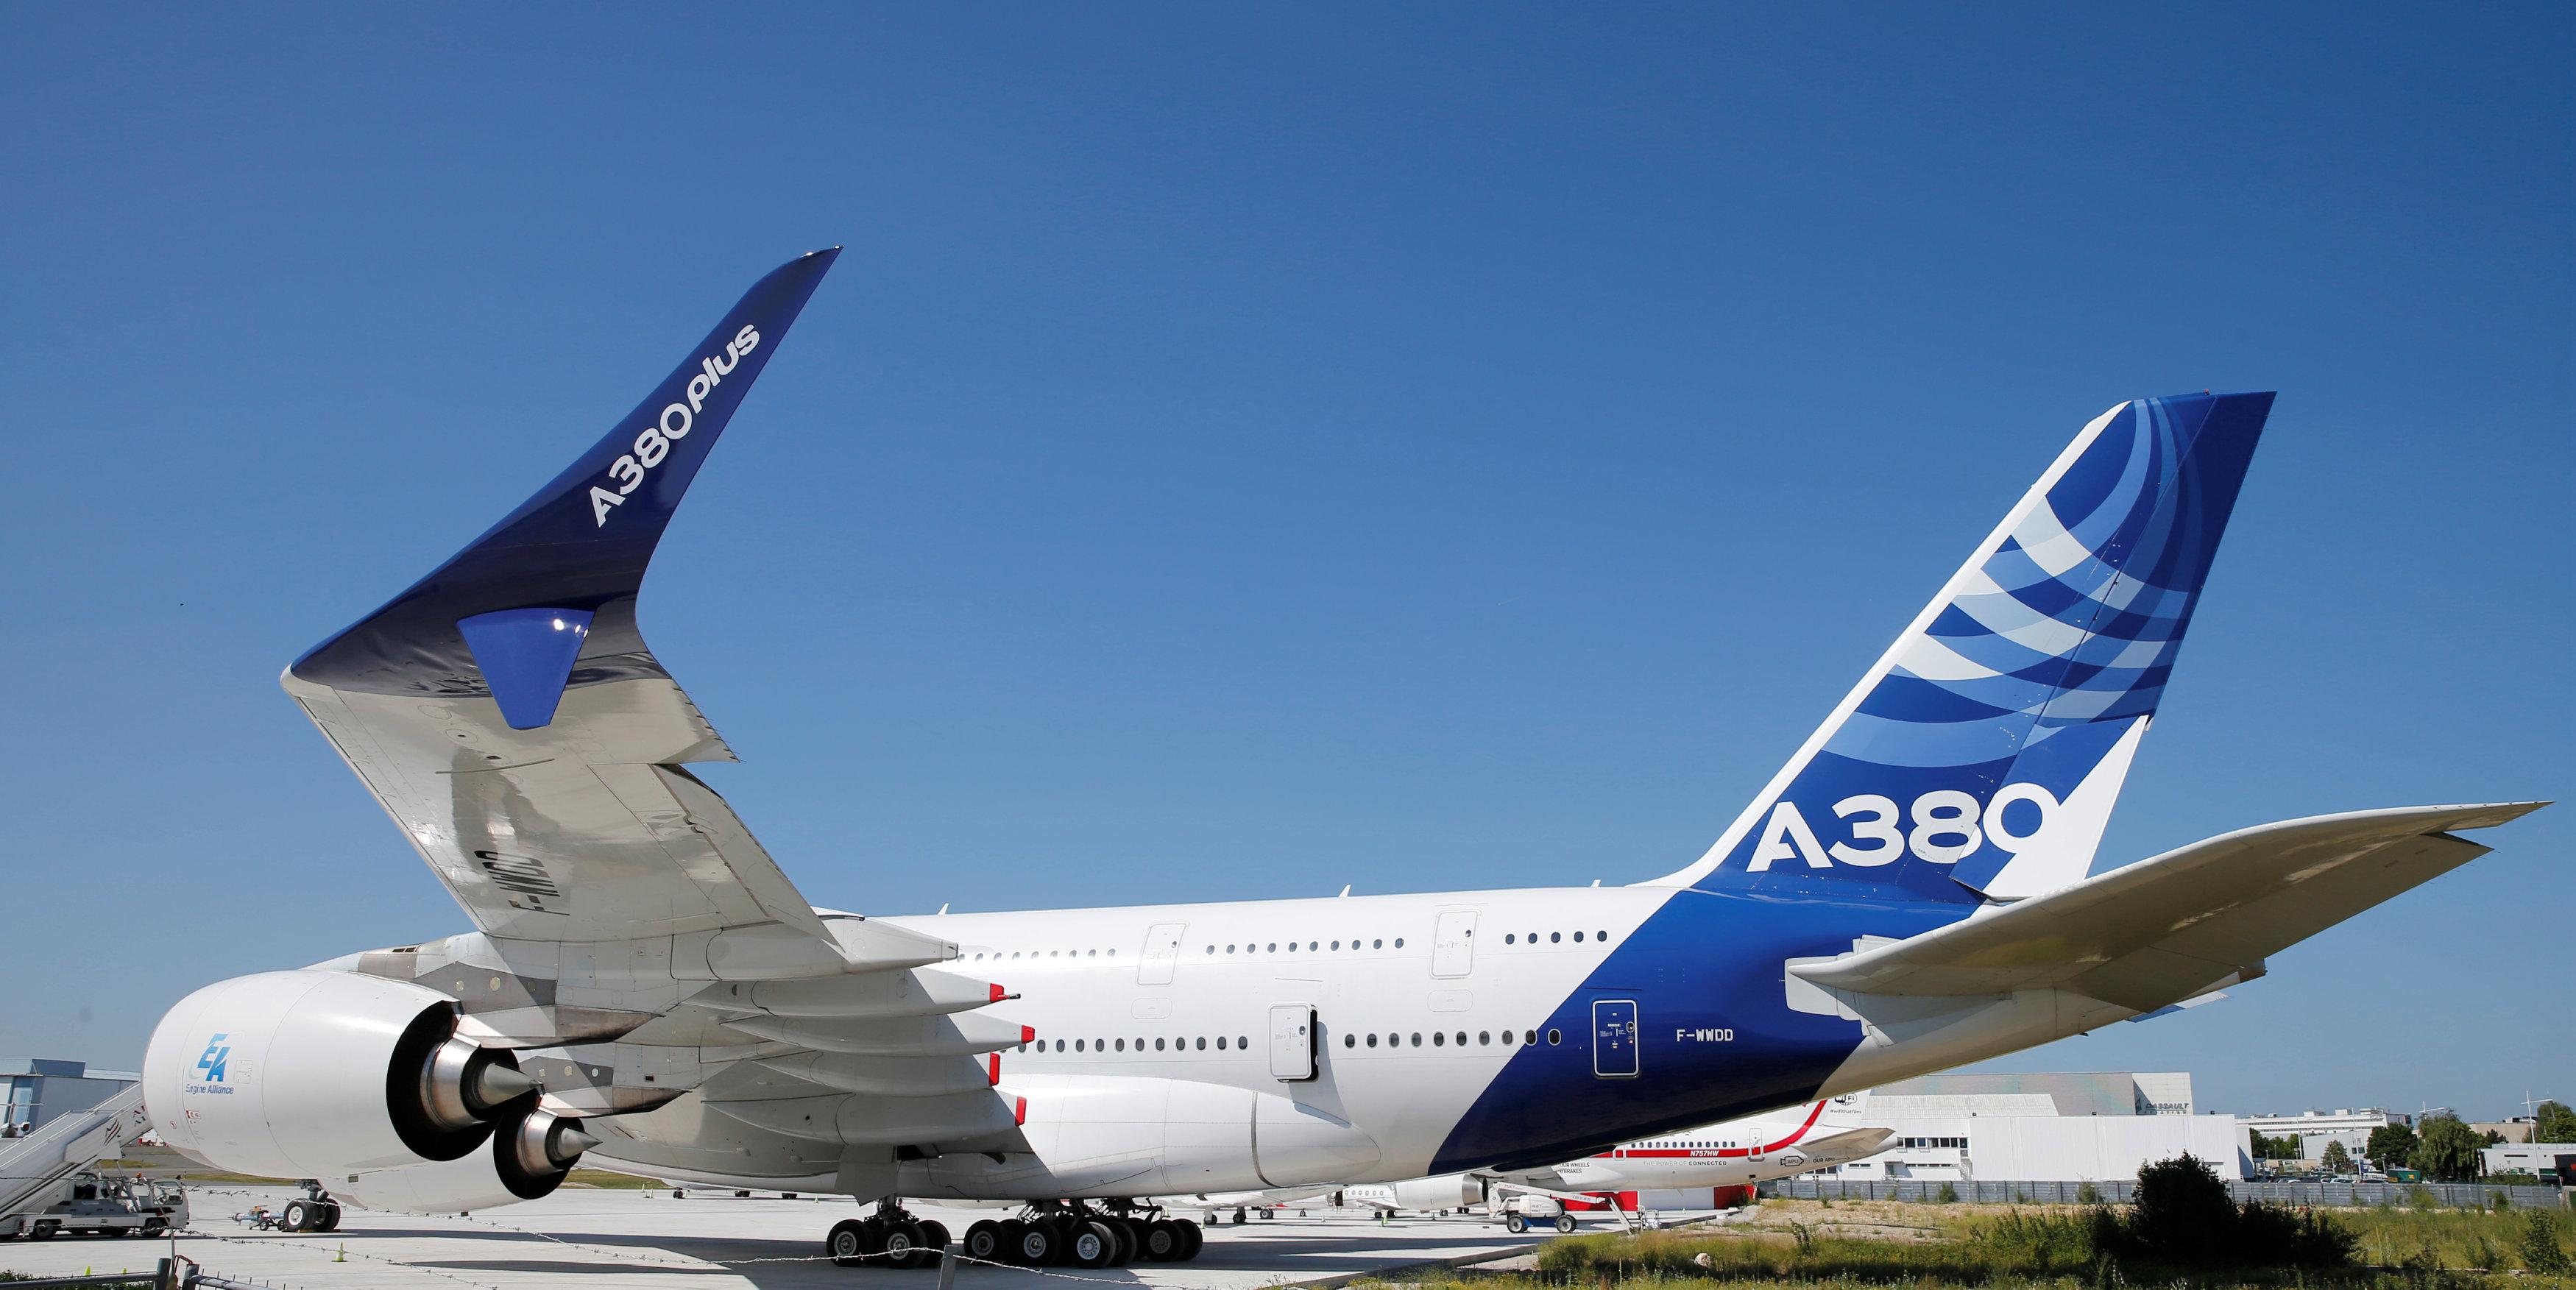 Airbus upgrades world's biggest passenger jet